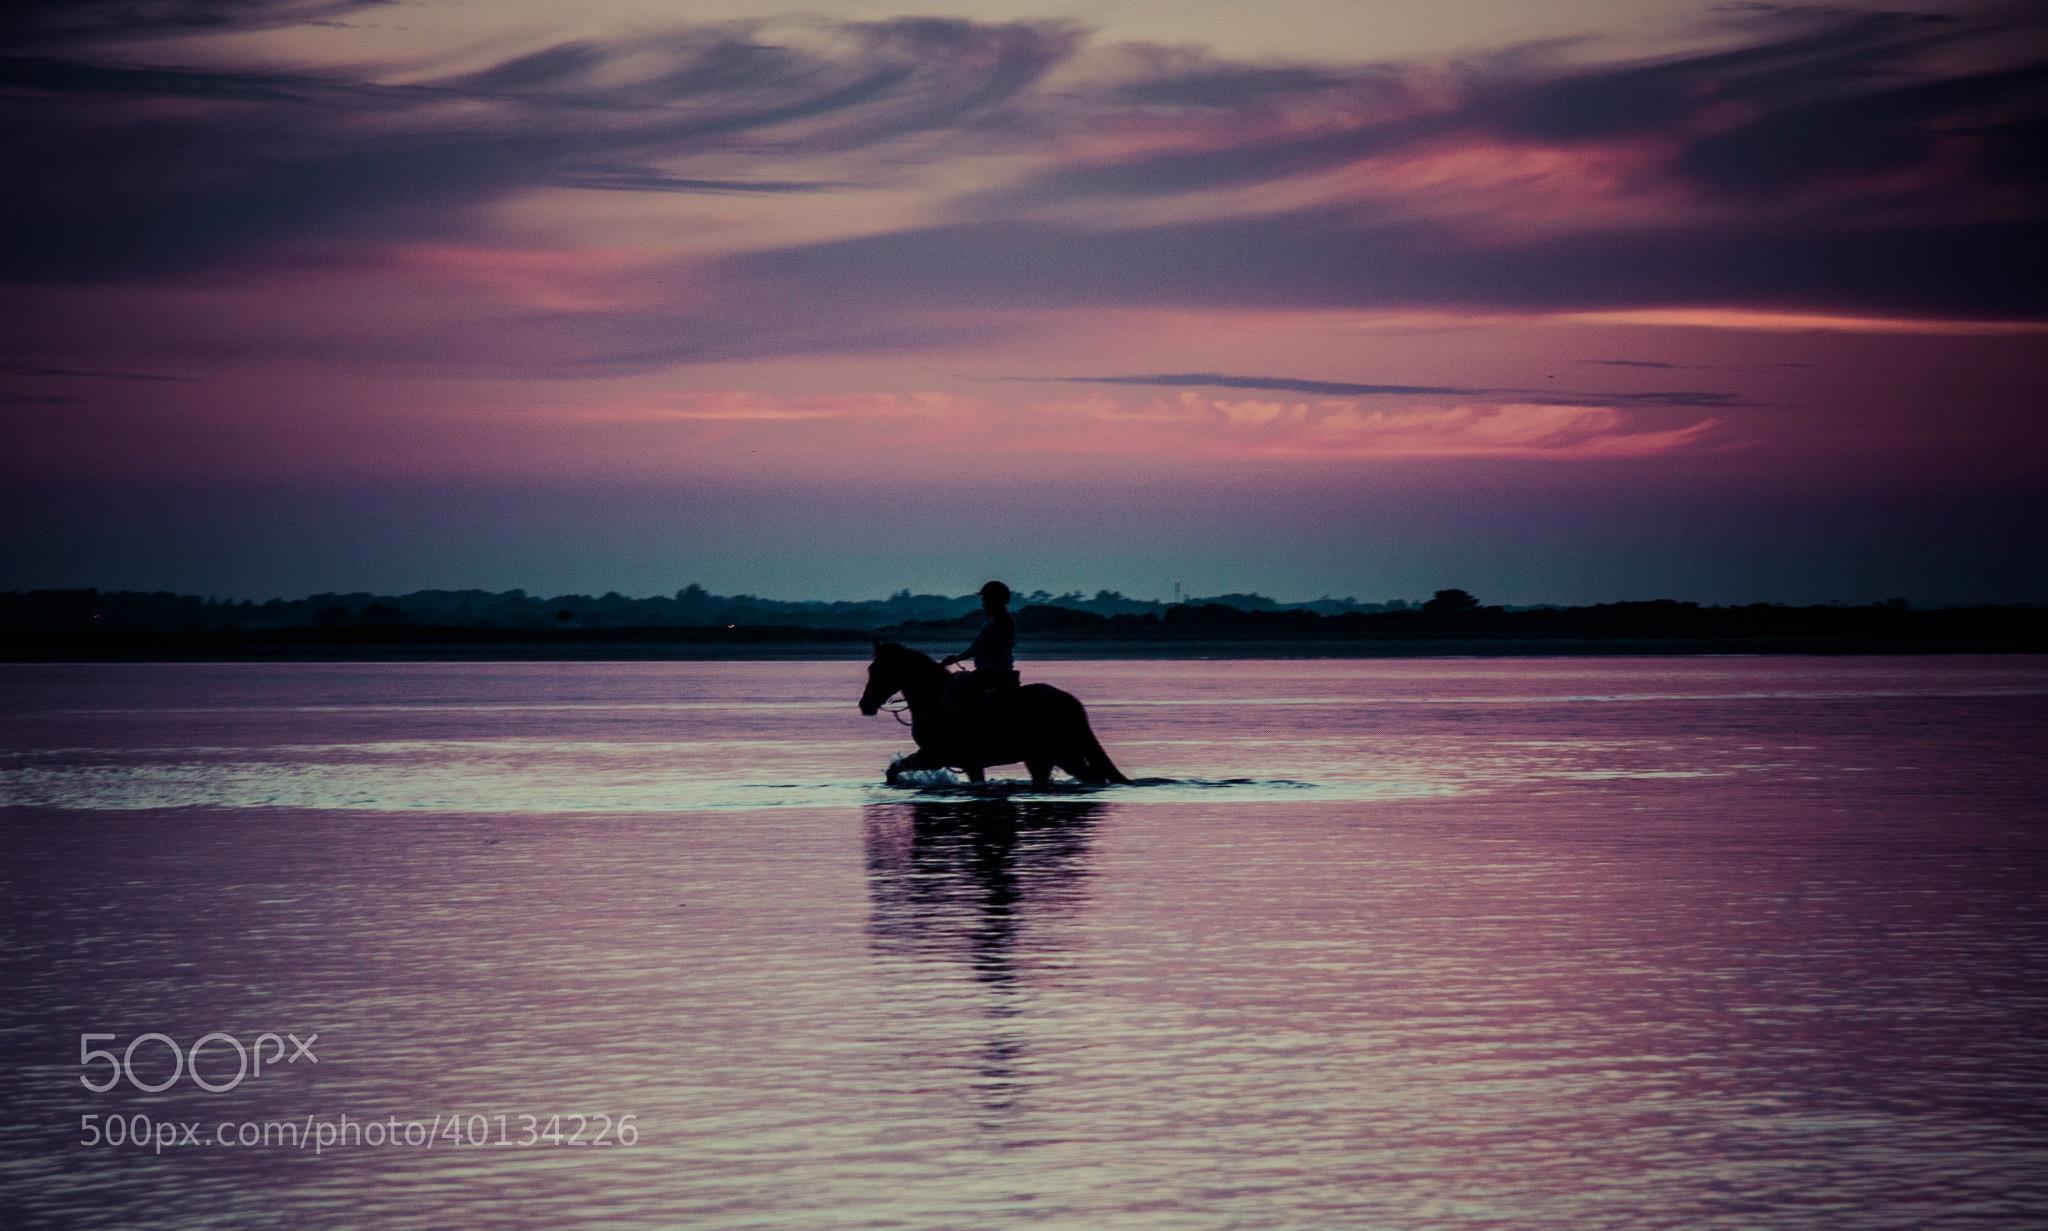 Photograph Sunset Rider by Dan Alexandru on 500px